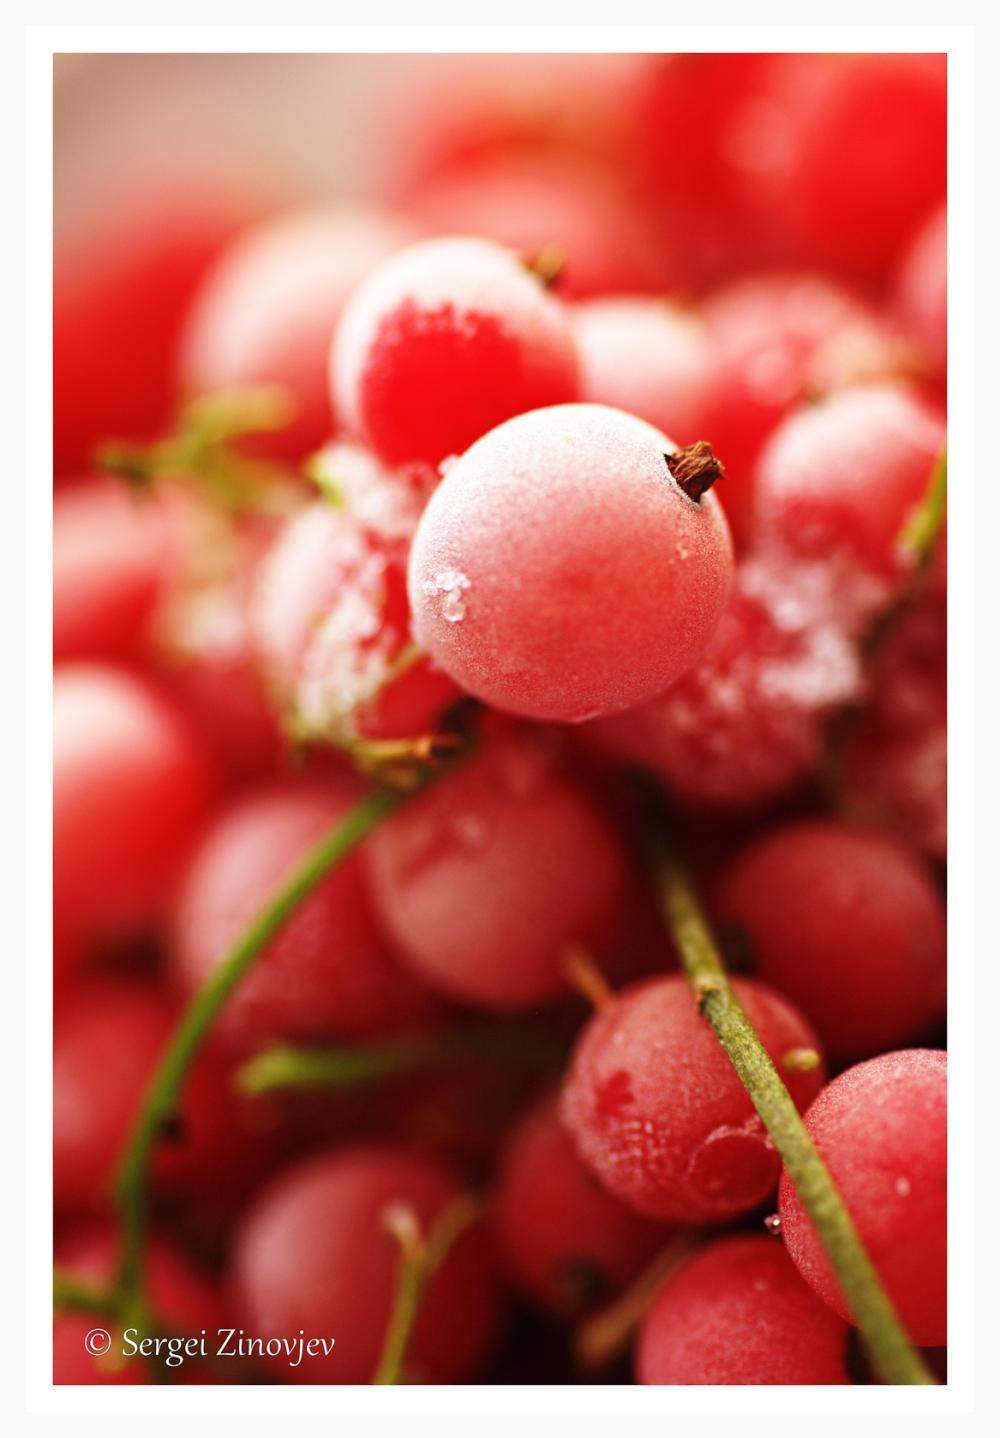 frozen red currants